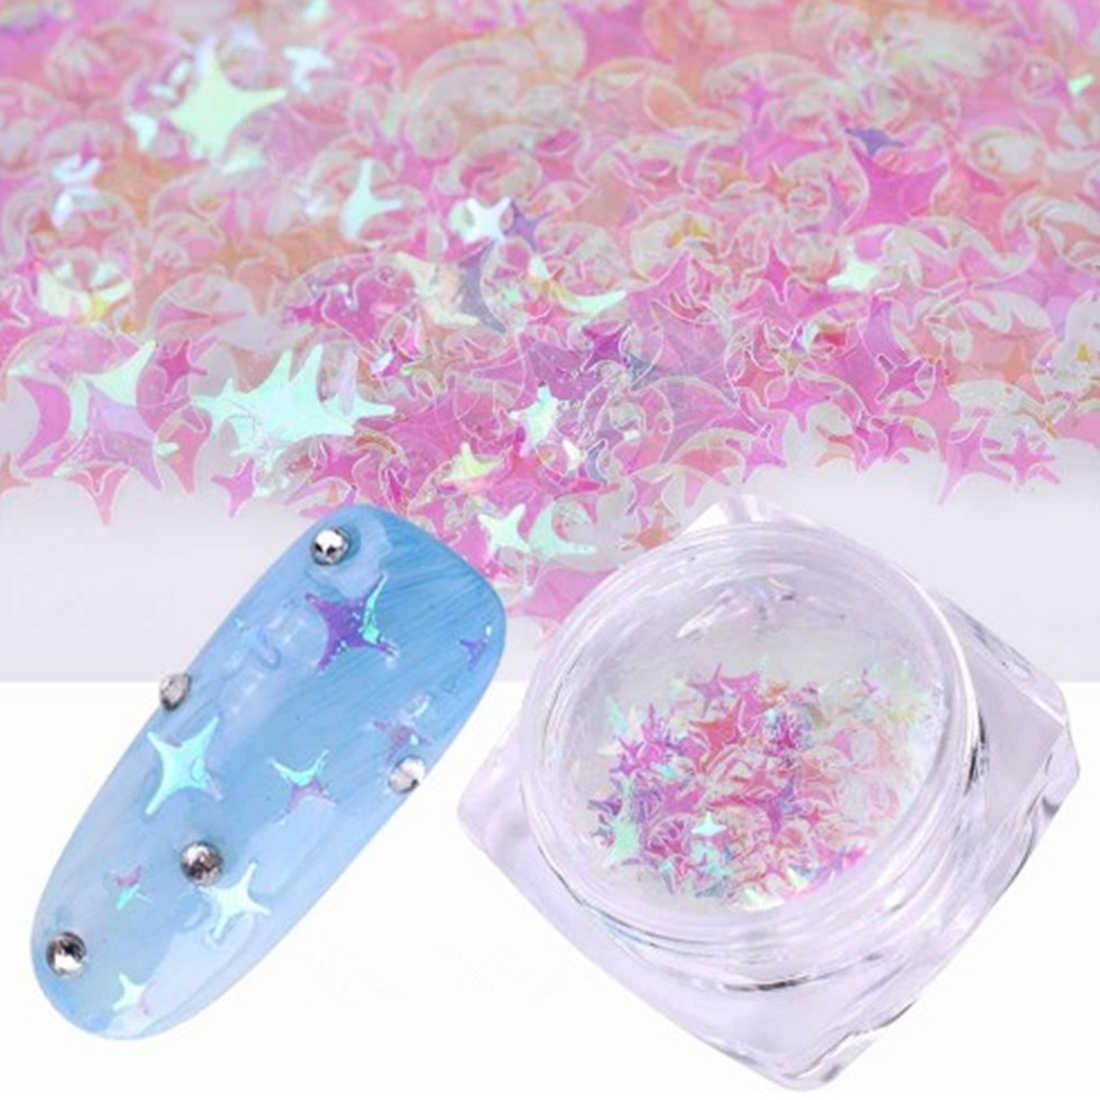 Glittering Nail Flake untuk Nail Art Dekorasi DIY Paillette Fantasy 3/4mm Mix Ukuran Empat Sudut Bentuk Bintang Lucency Cantik Sequin